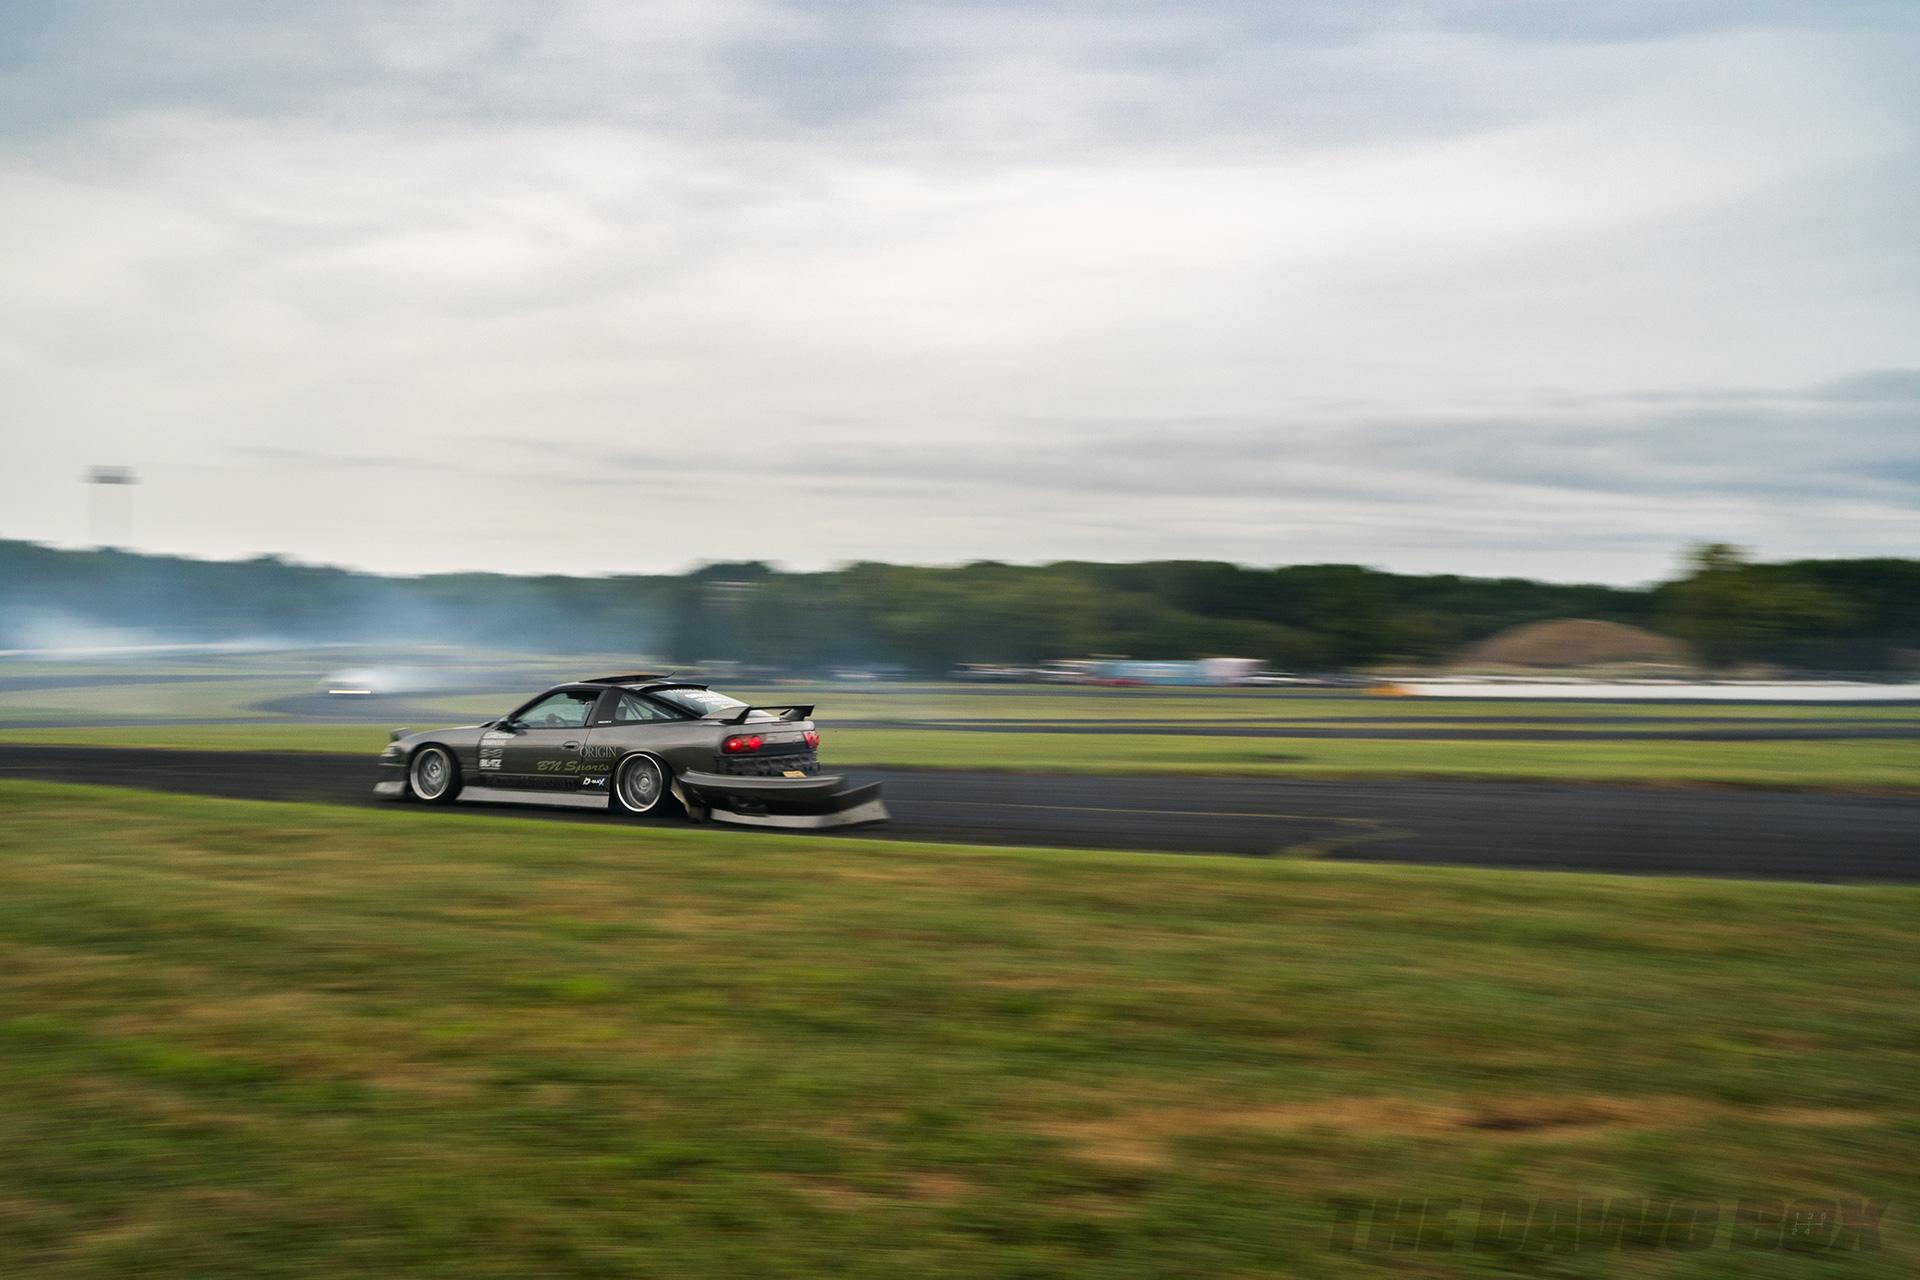 S13 fastback losing aftermarket bumper